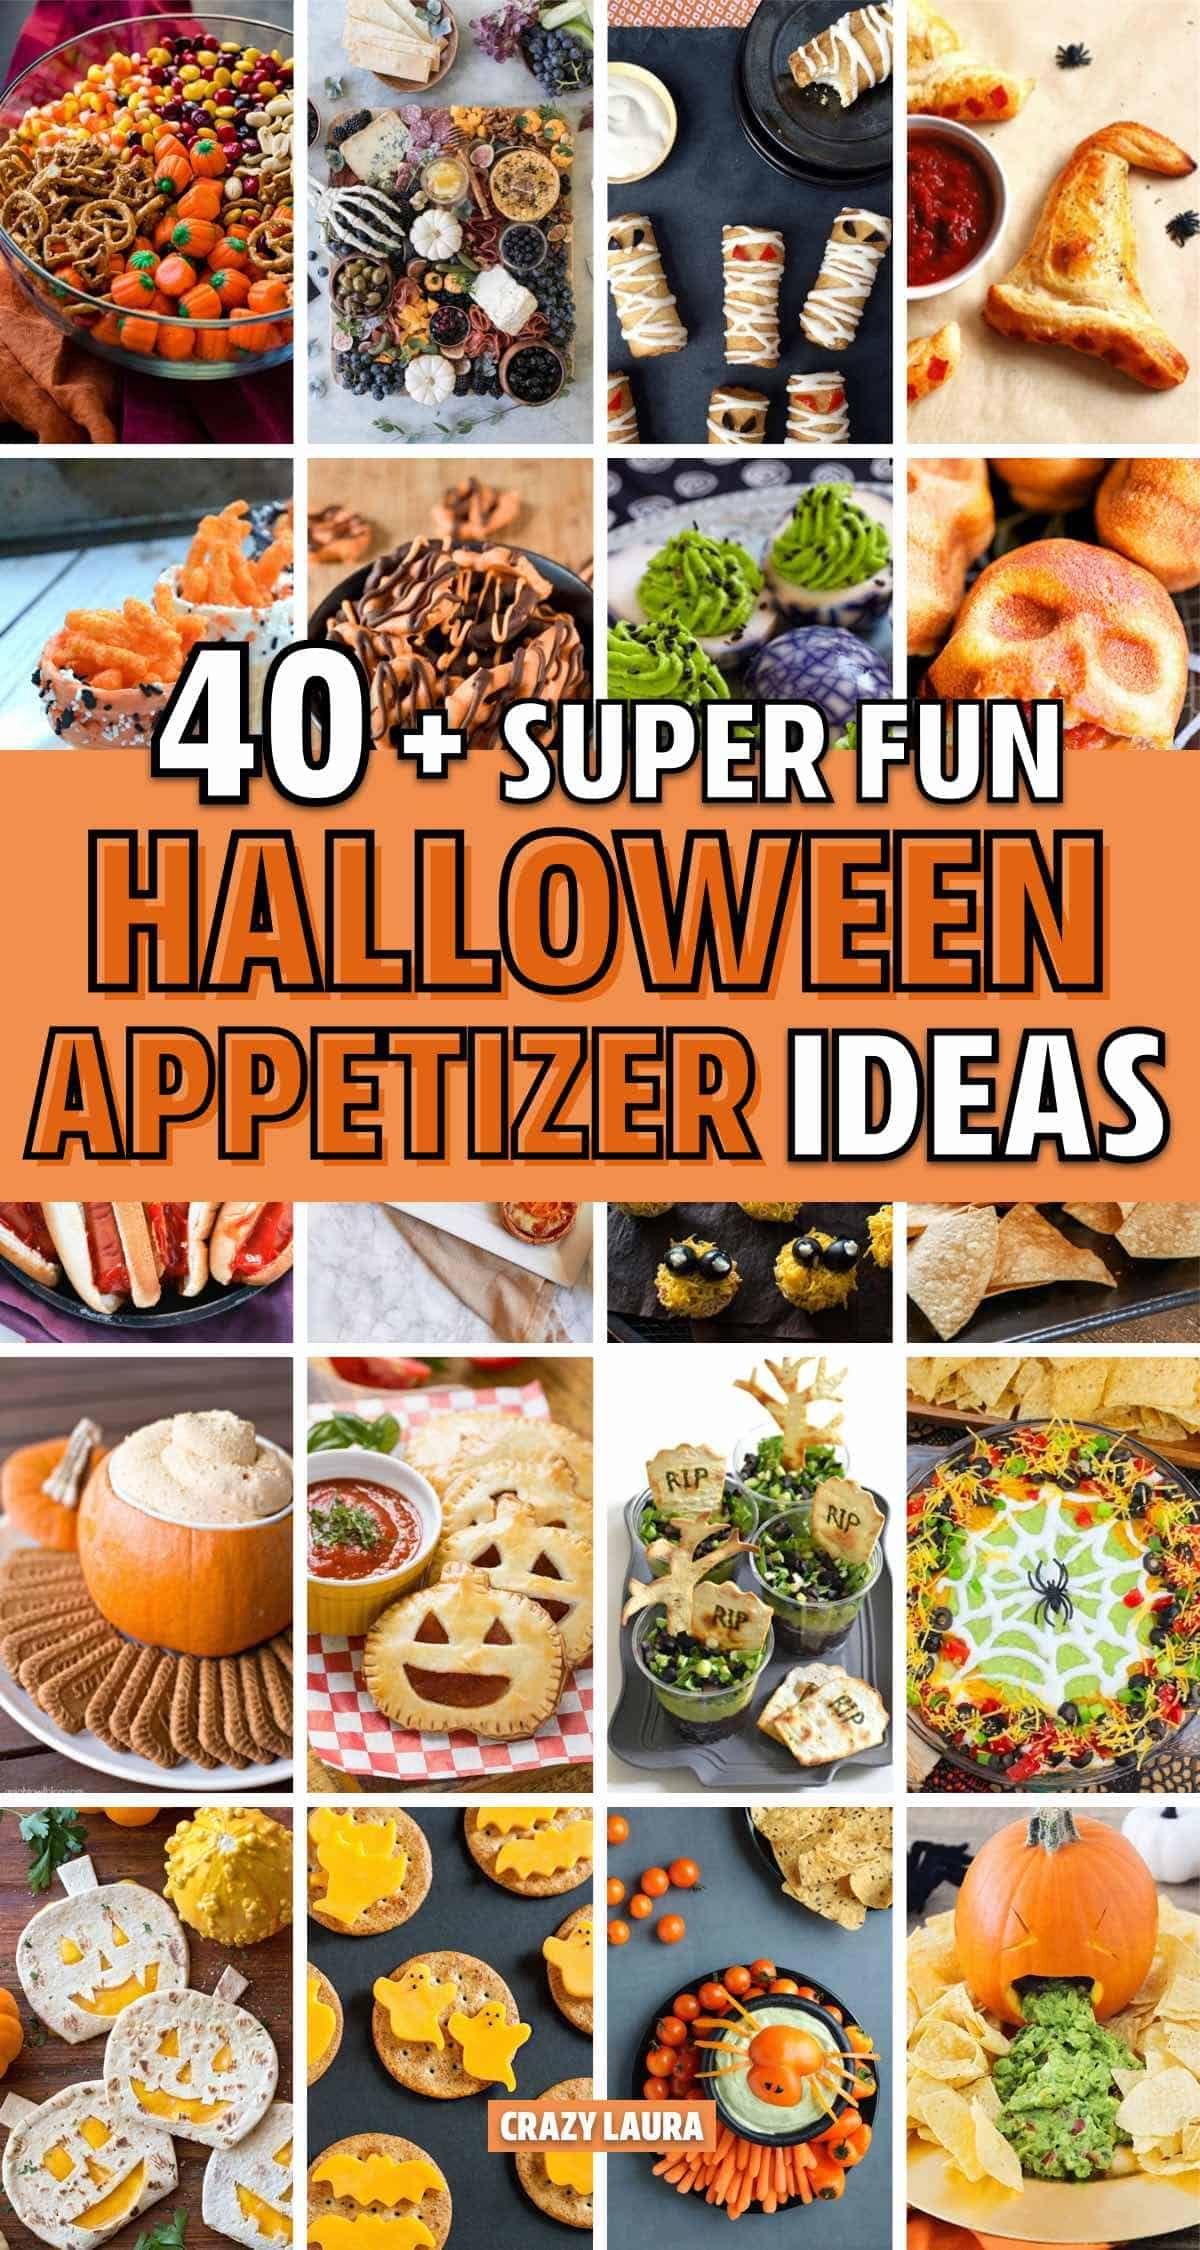 40+ Best Halloween Appetizer & Snack Ideas For 2020